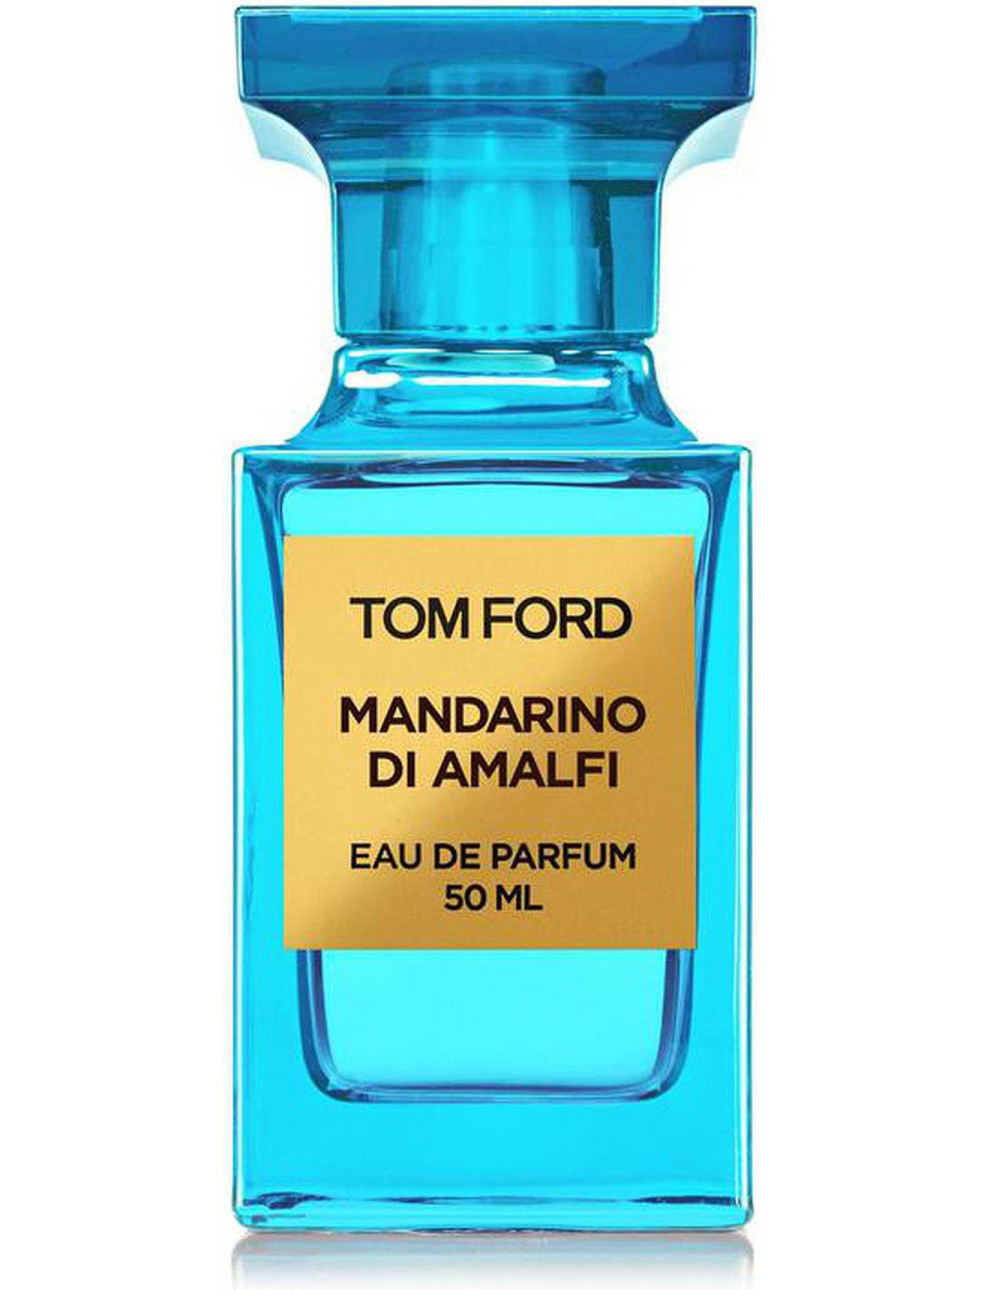 MANDARINO DI ALMALFI by TOM FORD 5ml Travel Spray Civet Tarragon Lemon Parfum